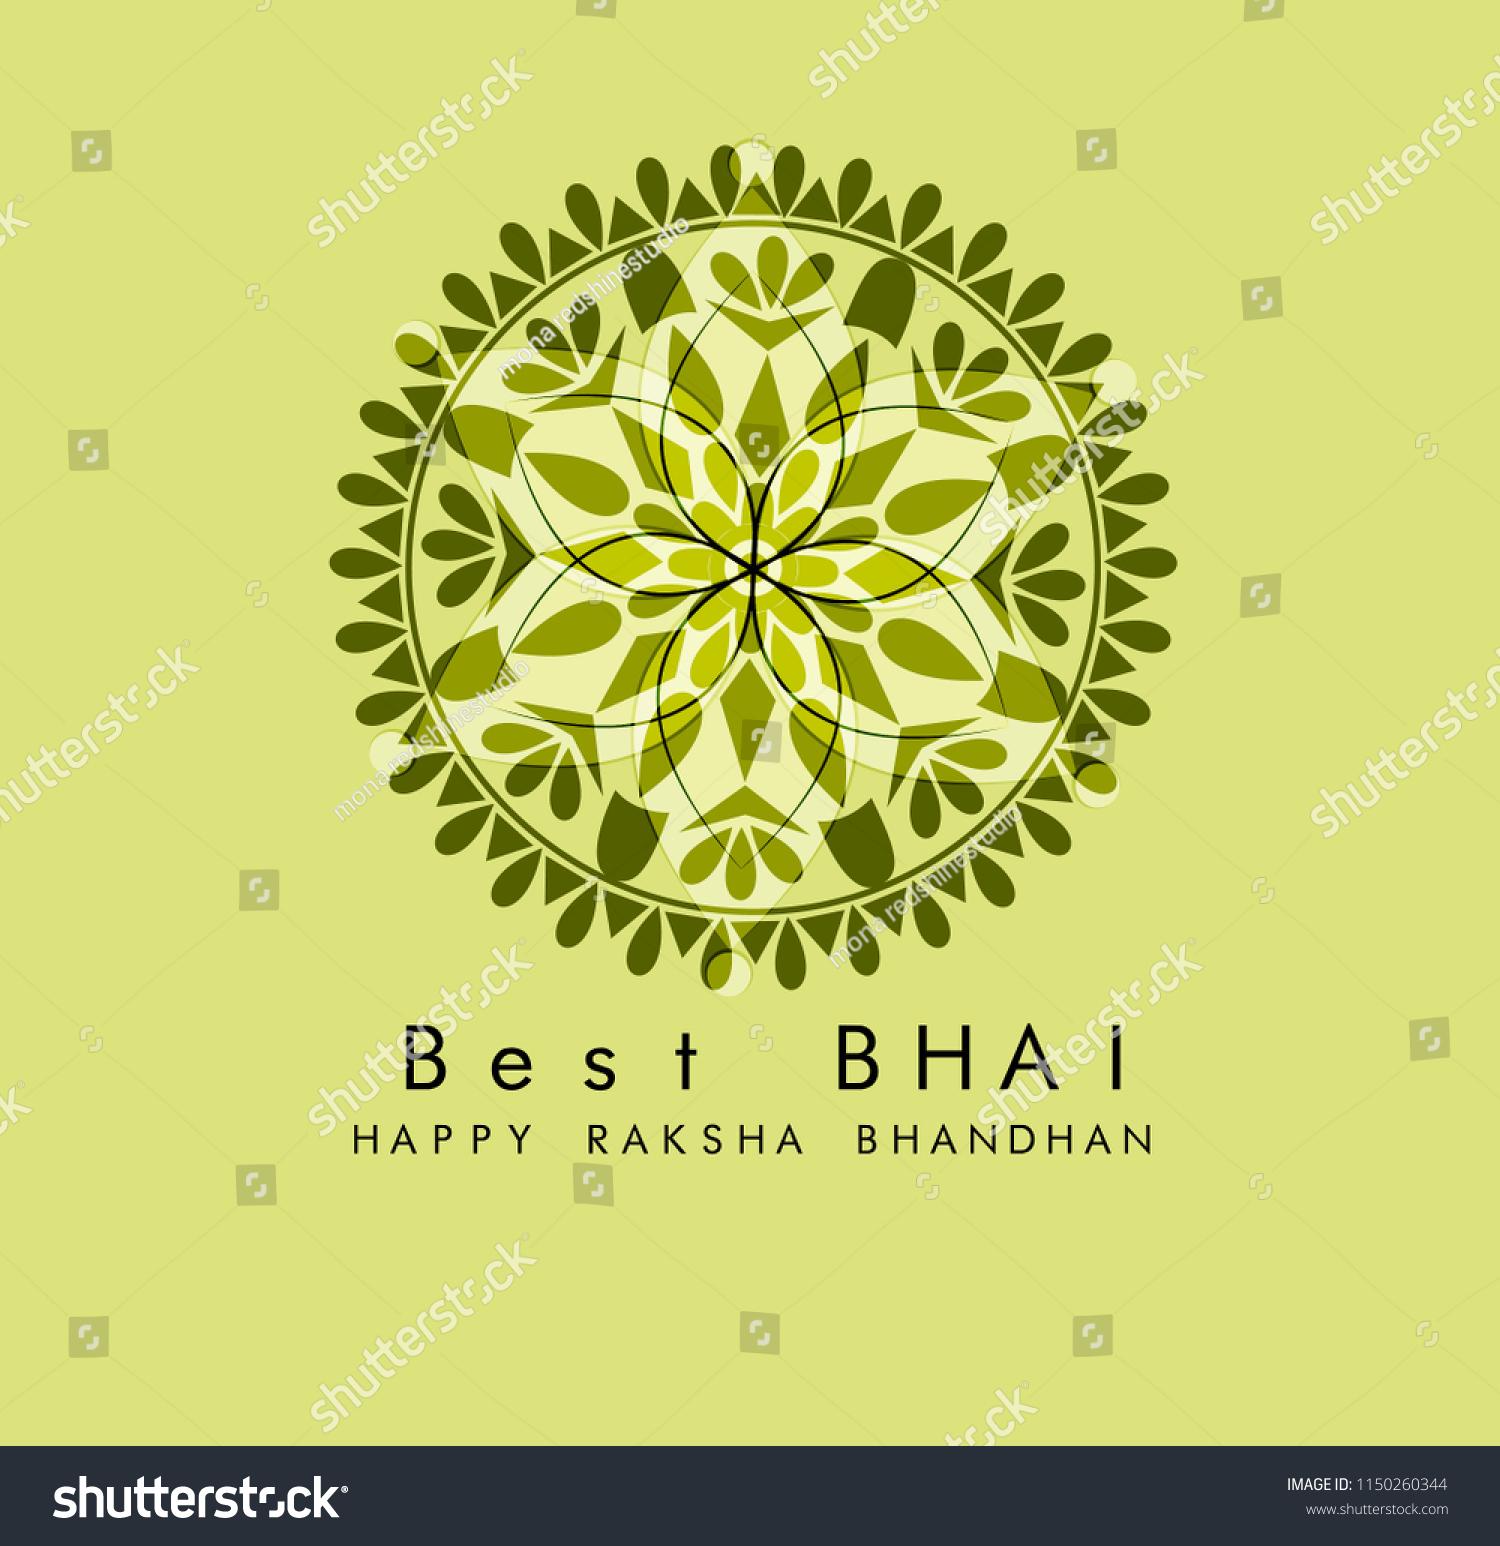 Greeting Card Decorative Rakhi Raksha Bandhan Stock Vector Royalty